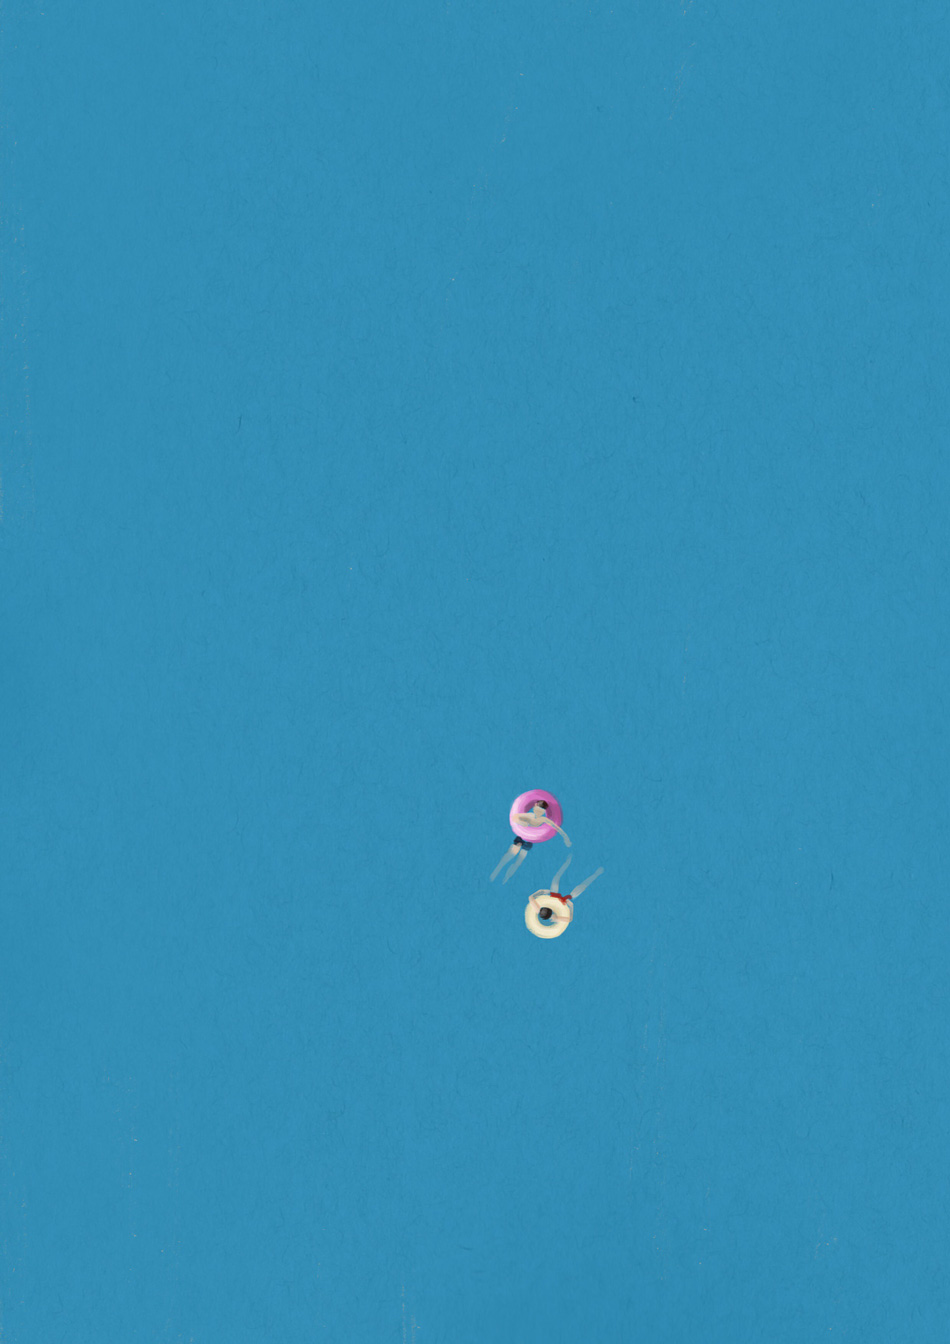 Life's-A-Beach-XI-by-Paola-van-der-Hulst